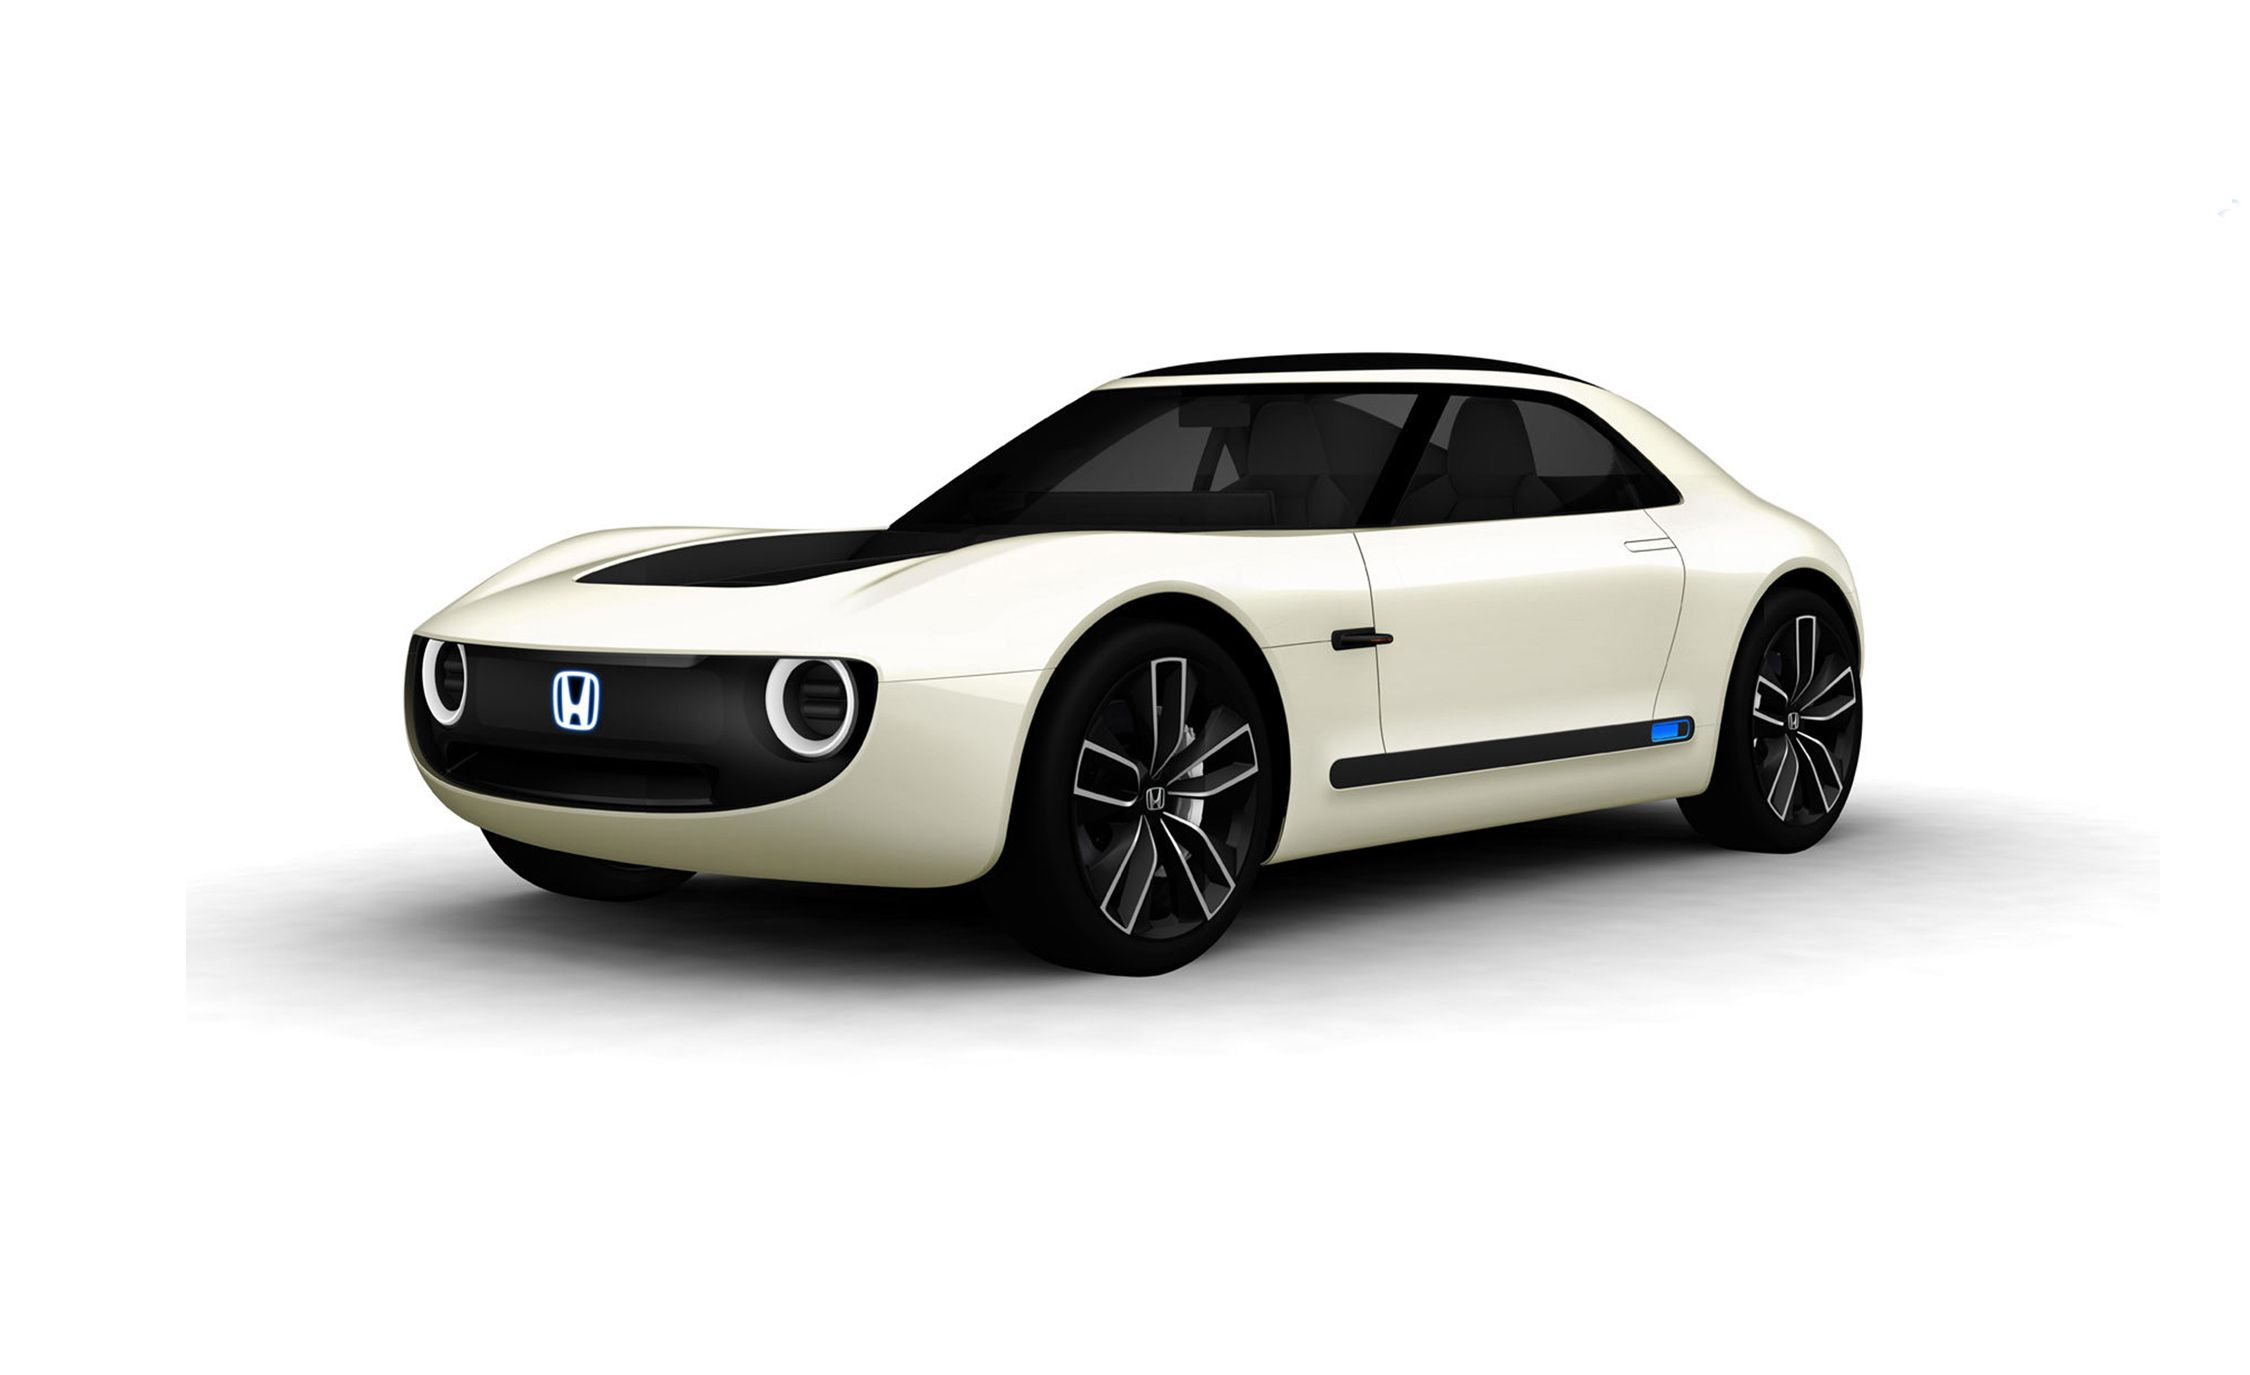 Attirant Honda Sports EV Concept: Retro Electric Futurism